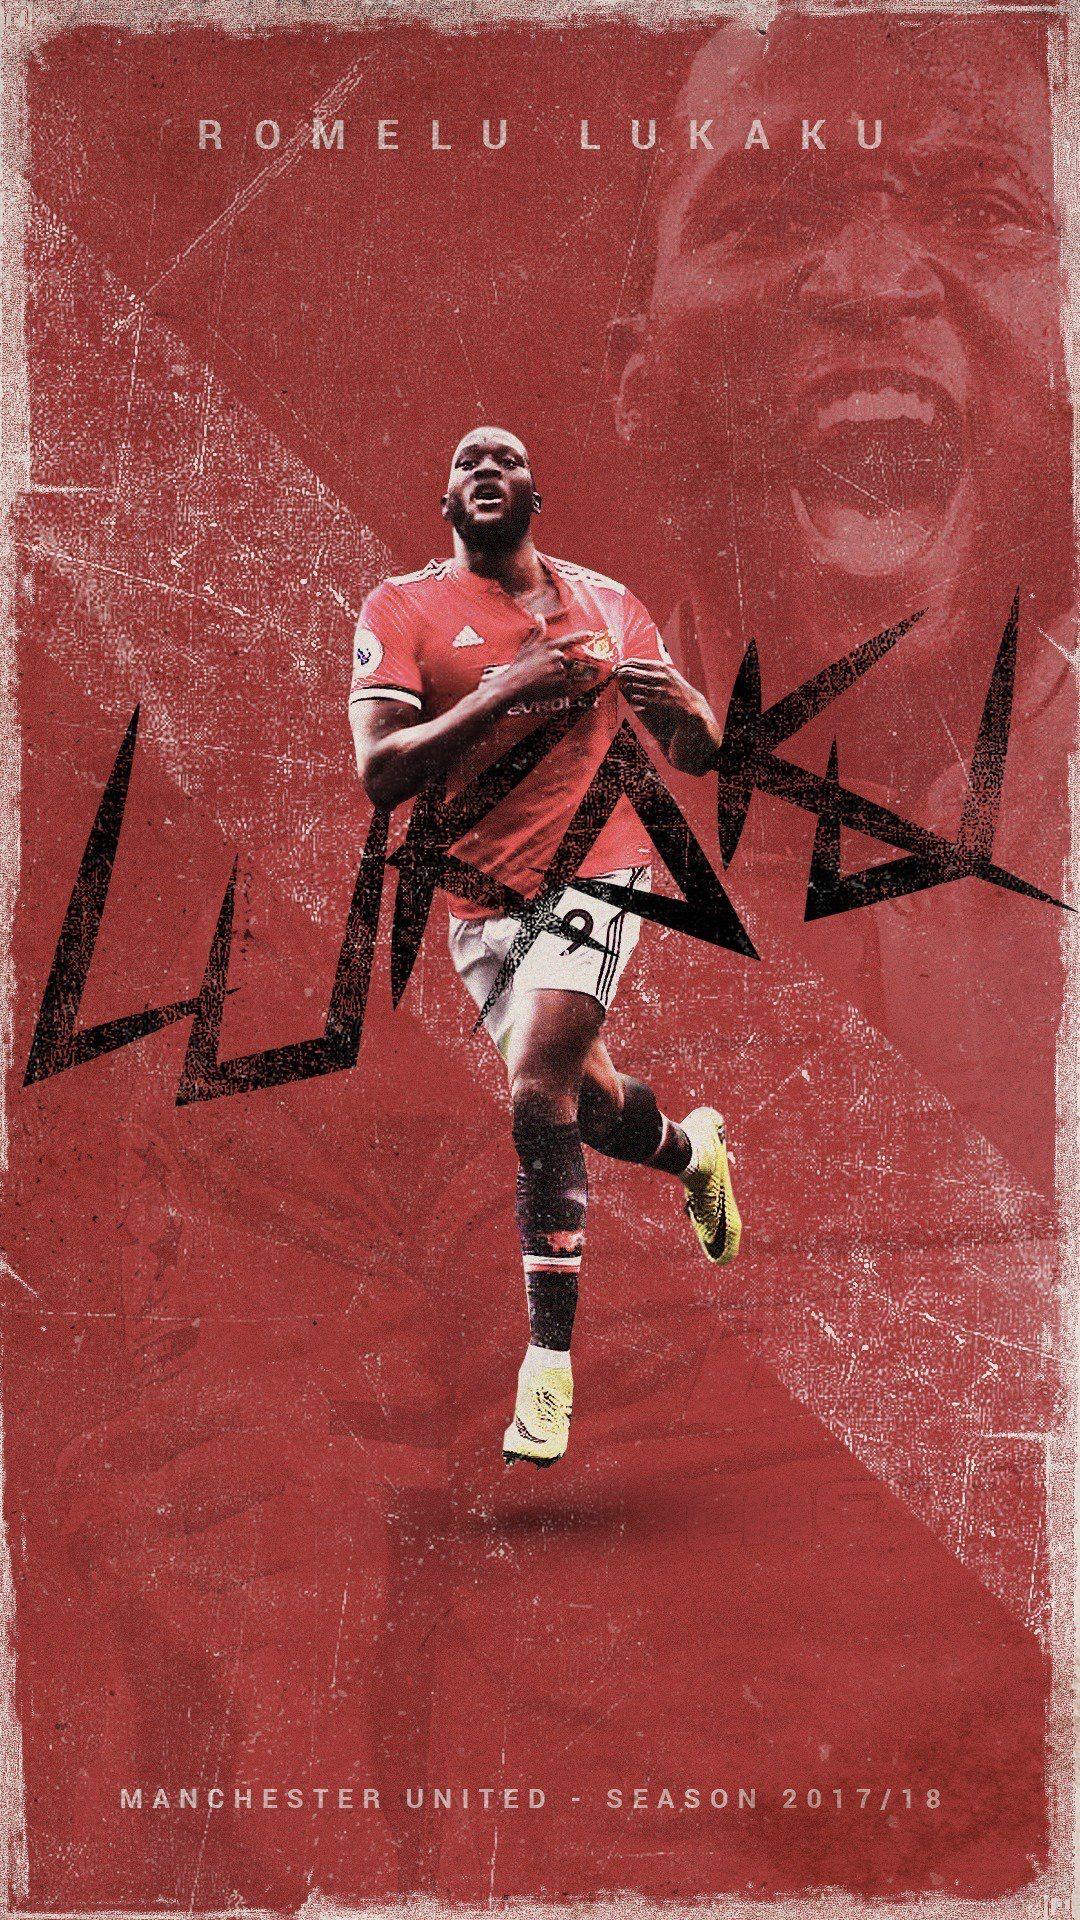 Romelu Lukaku ルカク ポグバ サッカー かっこいい